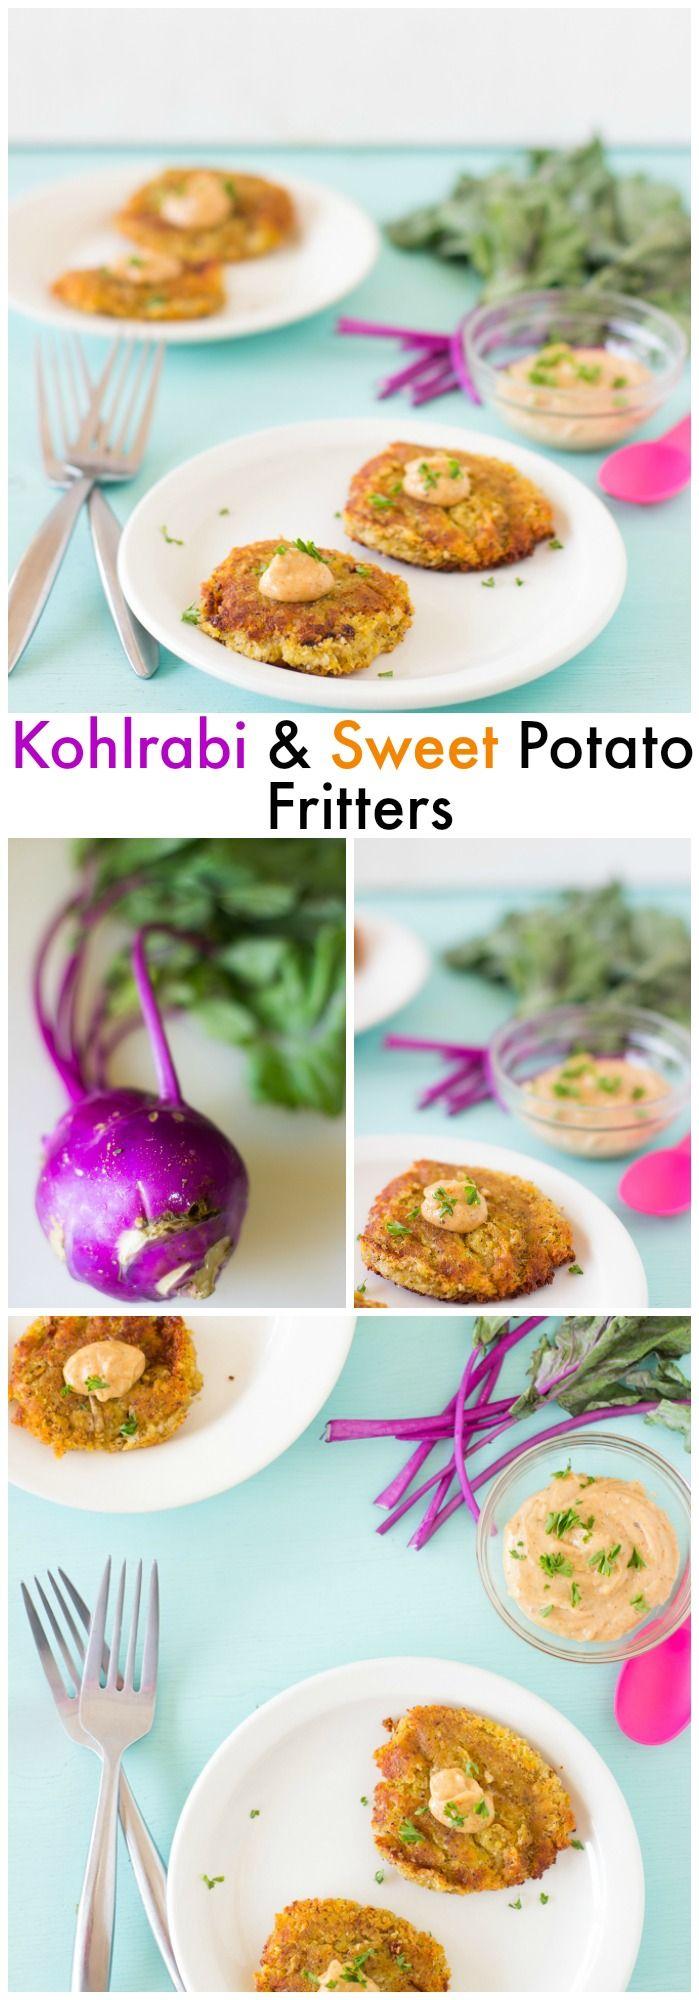 1000+ images about CSA Veggies - Kohlrabi on Pinterest | Spotlight ...